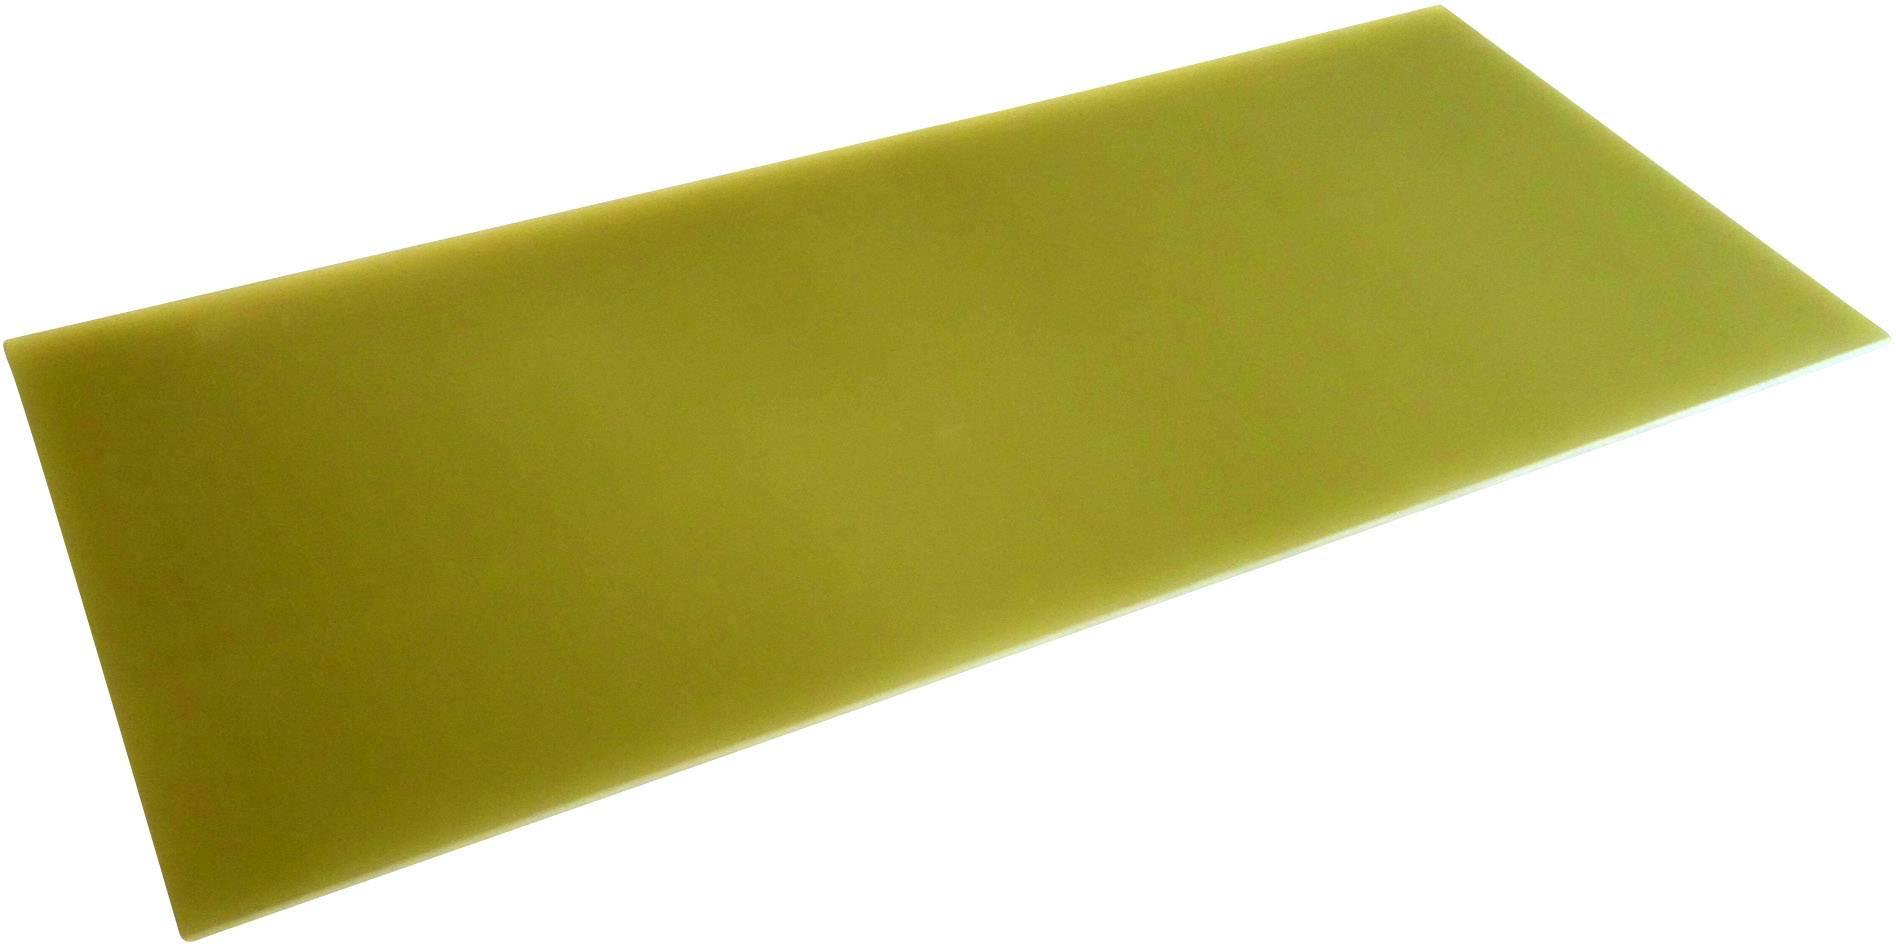 Epoxidová deska Carbotex 150 x 350 x 2 mm